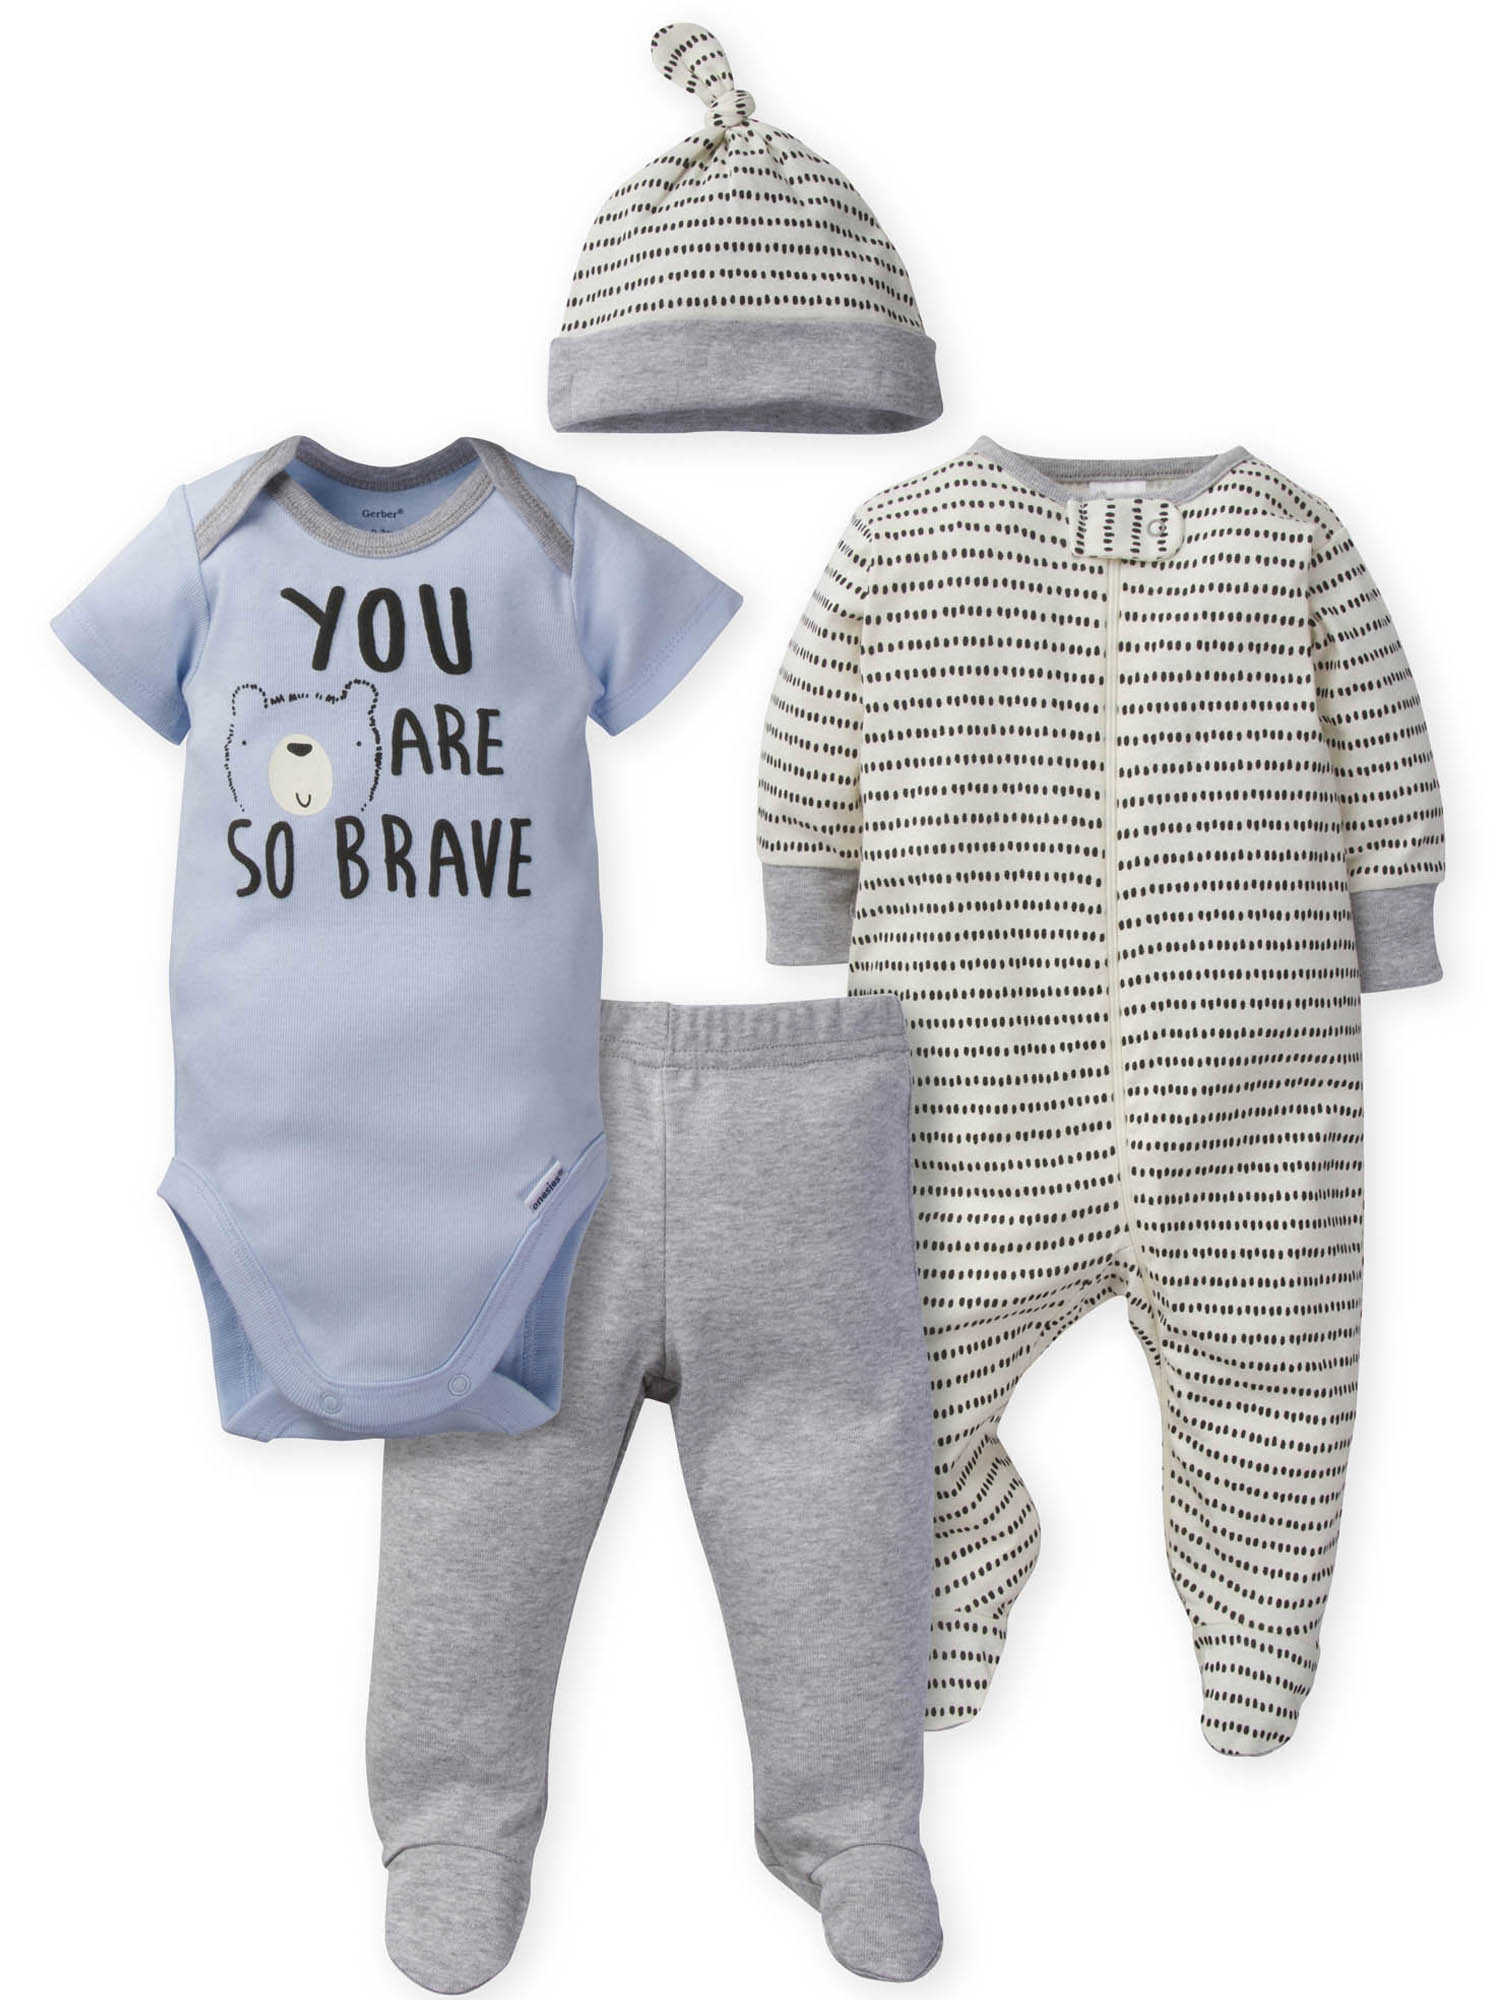 Unisex Baby Christmas Outfit Clothe Rompers Bodysuit 4Pc Set Shirt+Pant+Hat+Belt